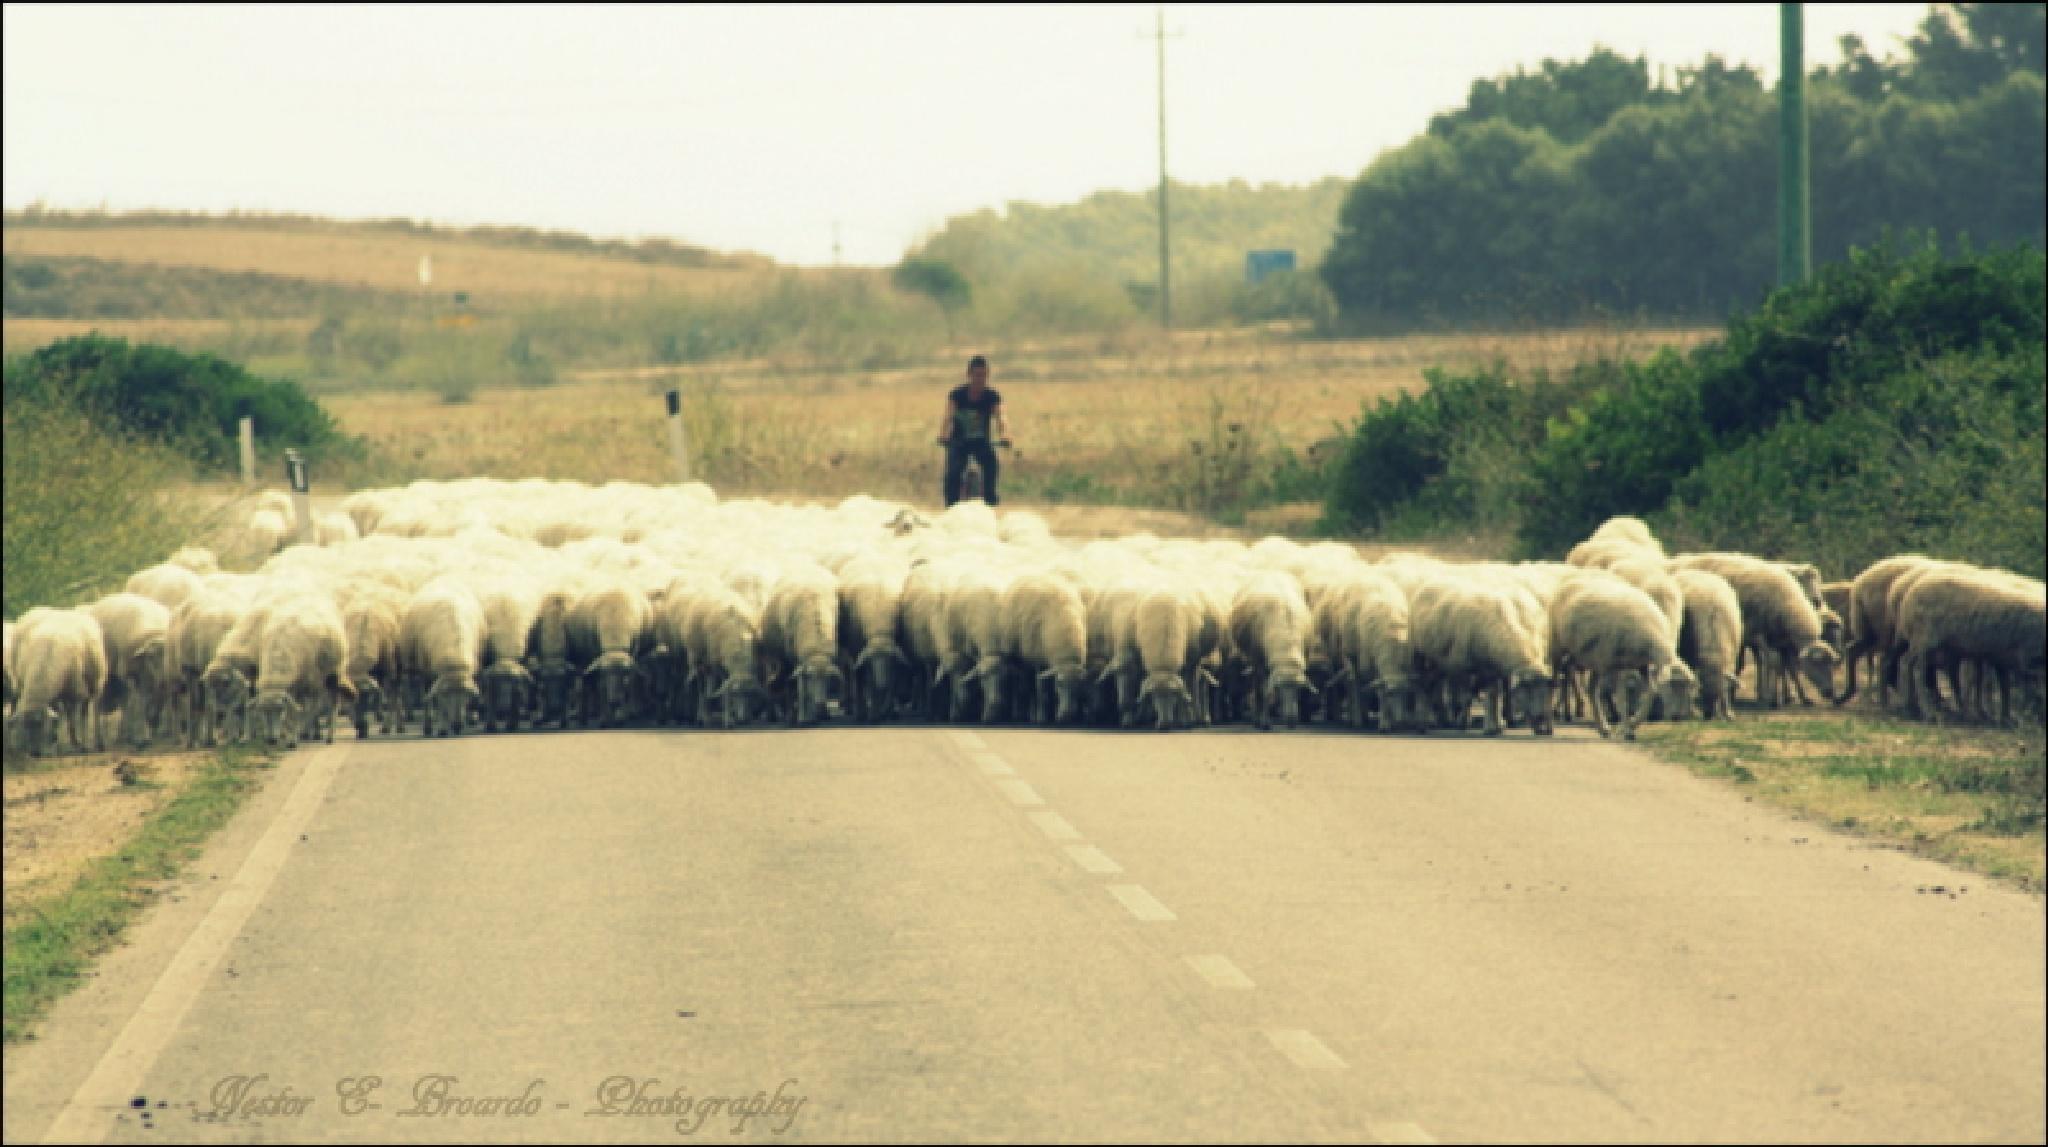 Pecore di Sardegna by nestorbroardo